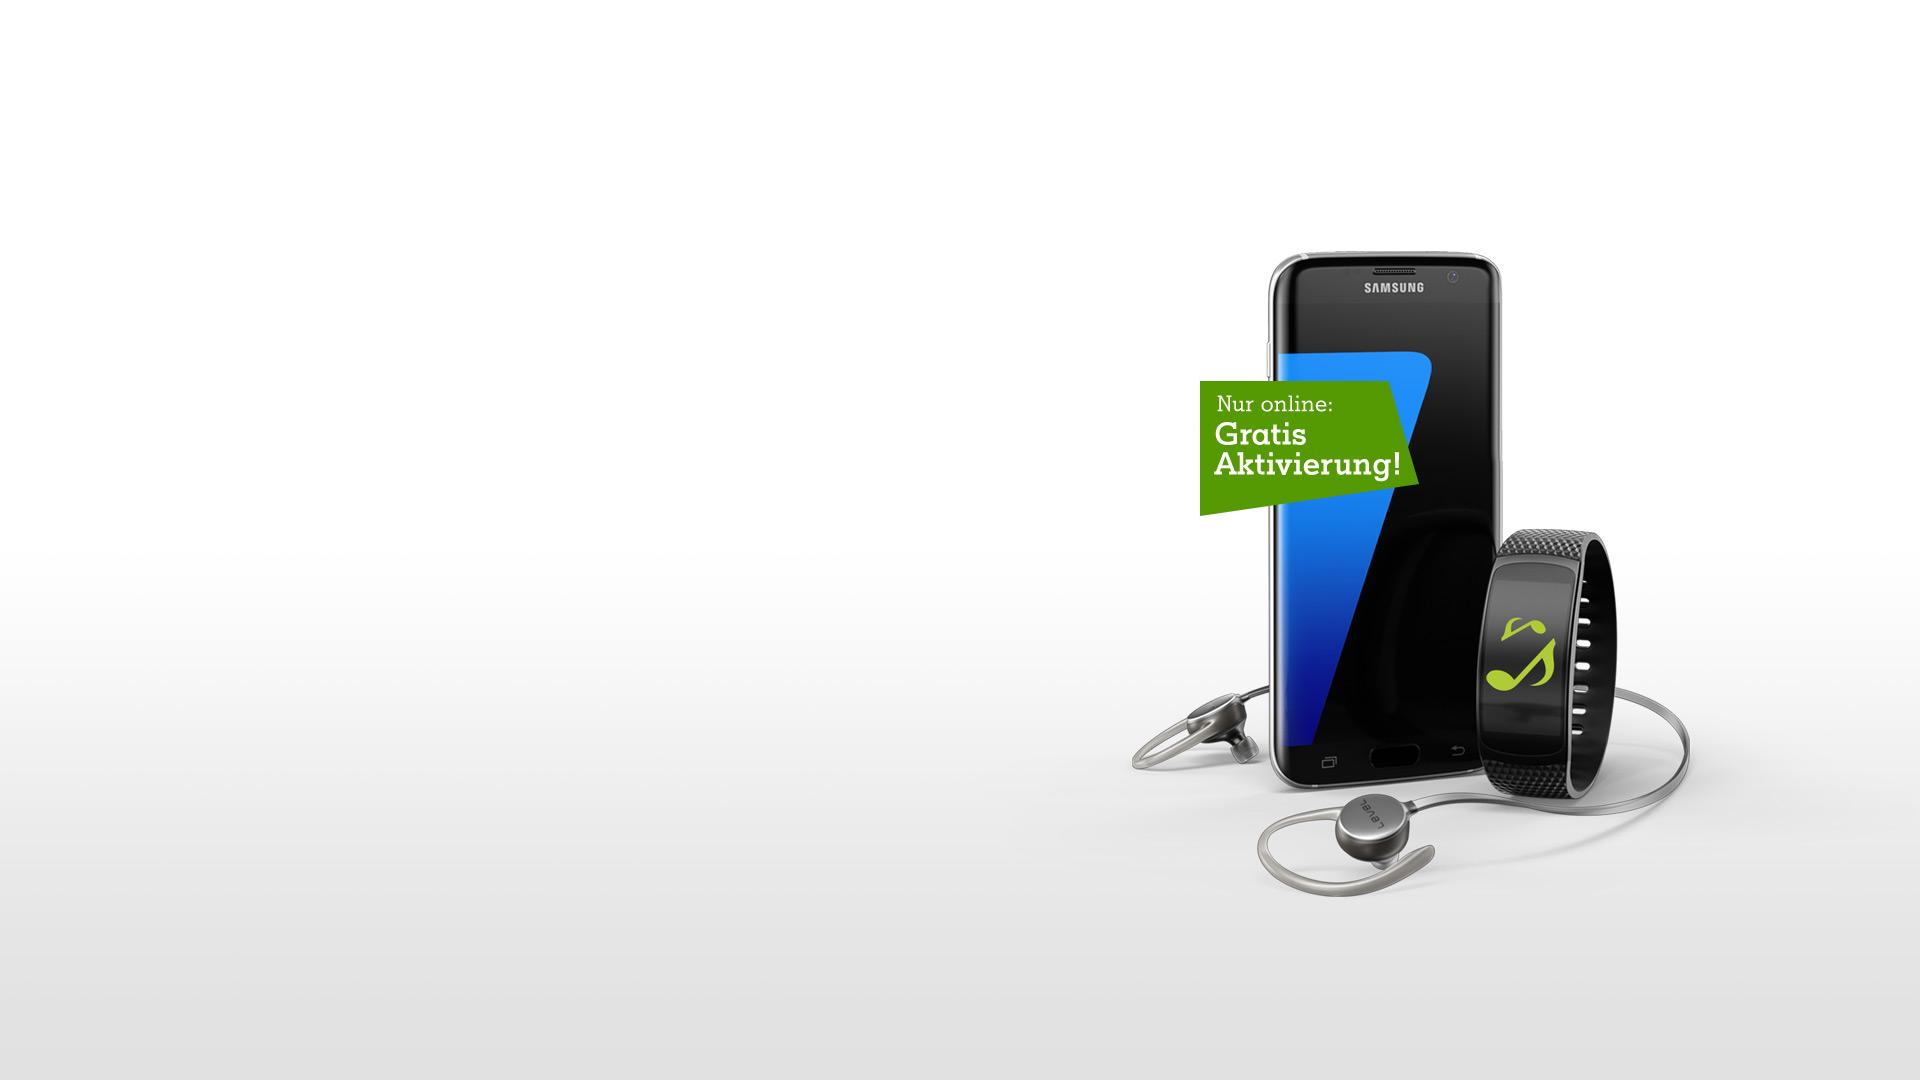 mobiles internet gratis testen